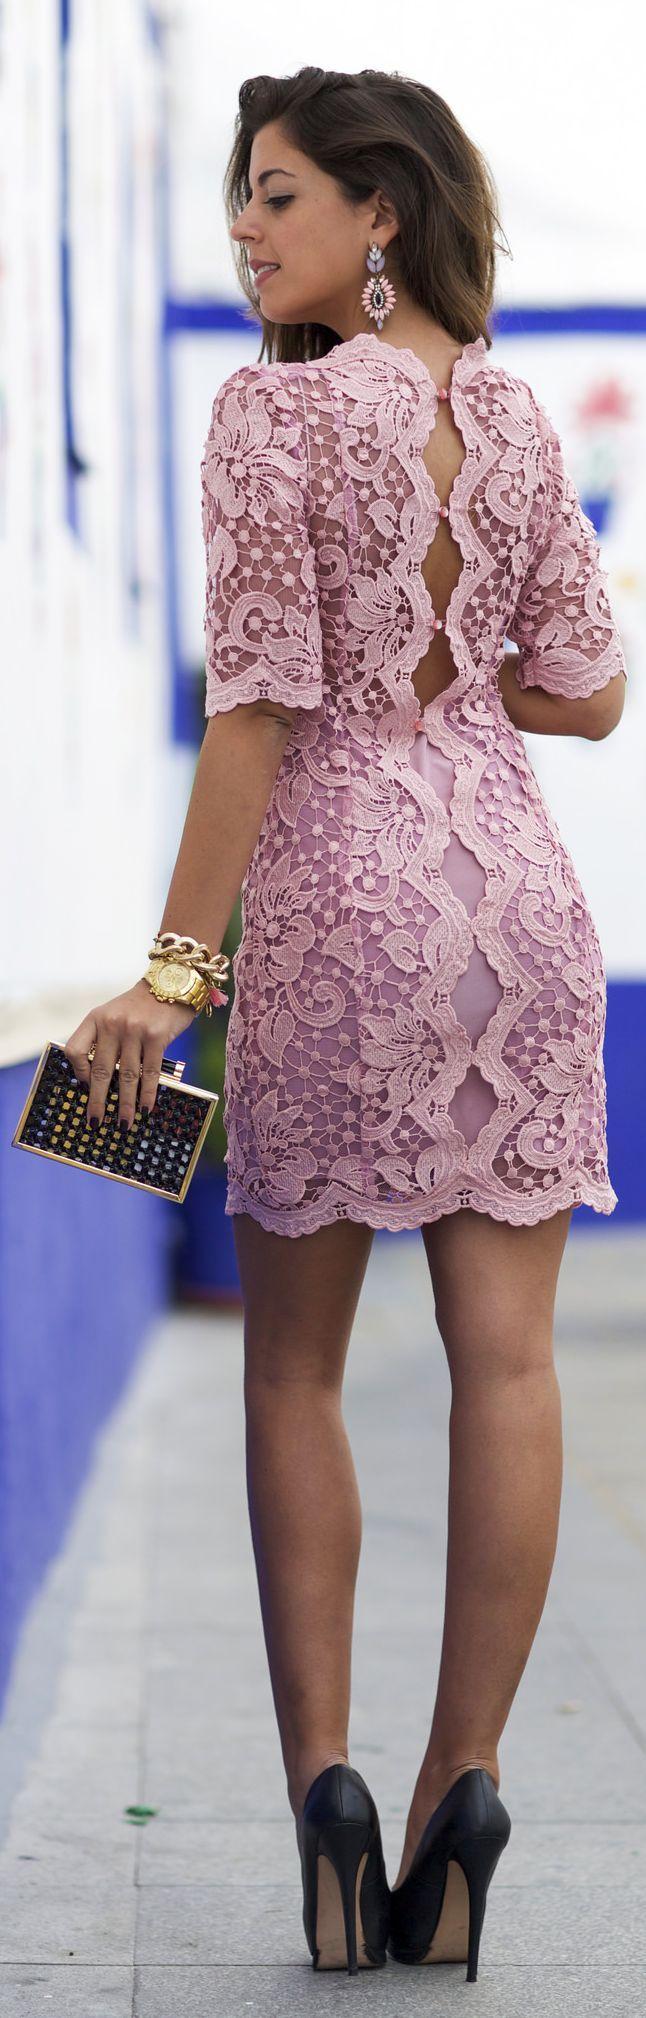 Flirty Open Back Lace Lpd by